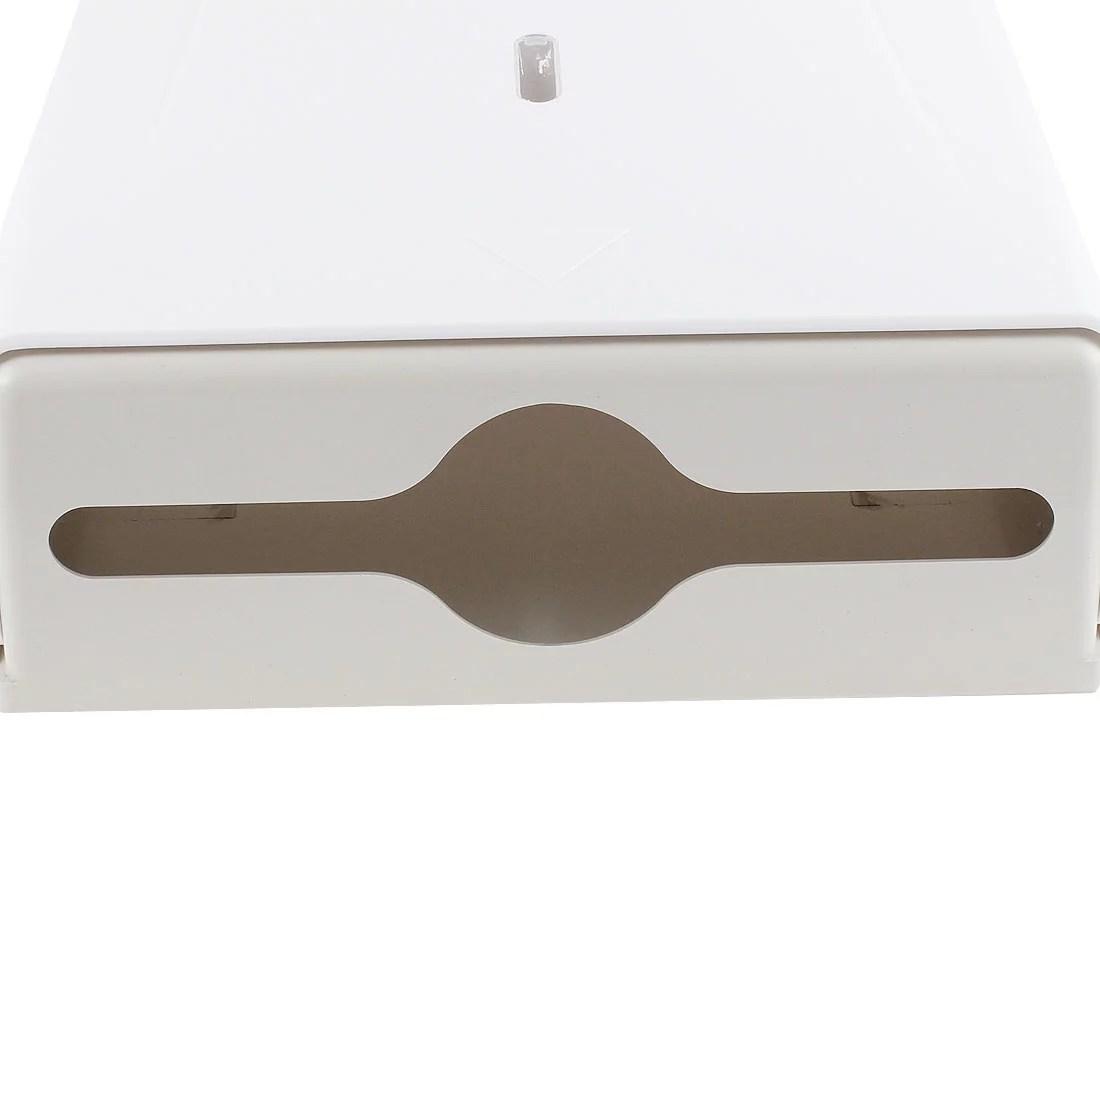 Restaurant Public Plastic Wall Mounted Paper Tissue Box Holder White